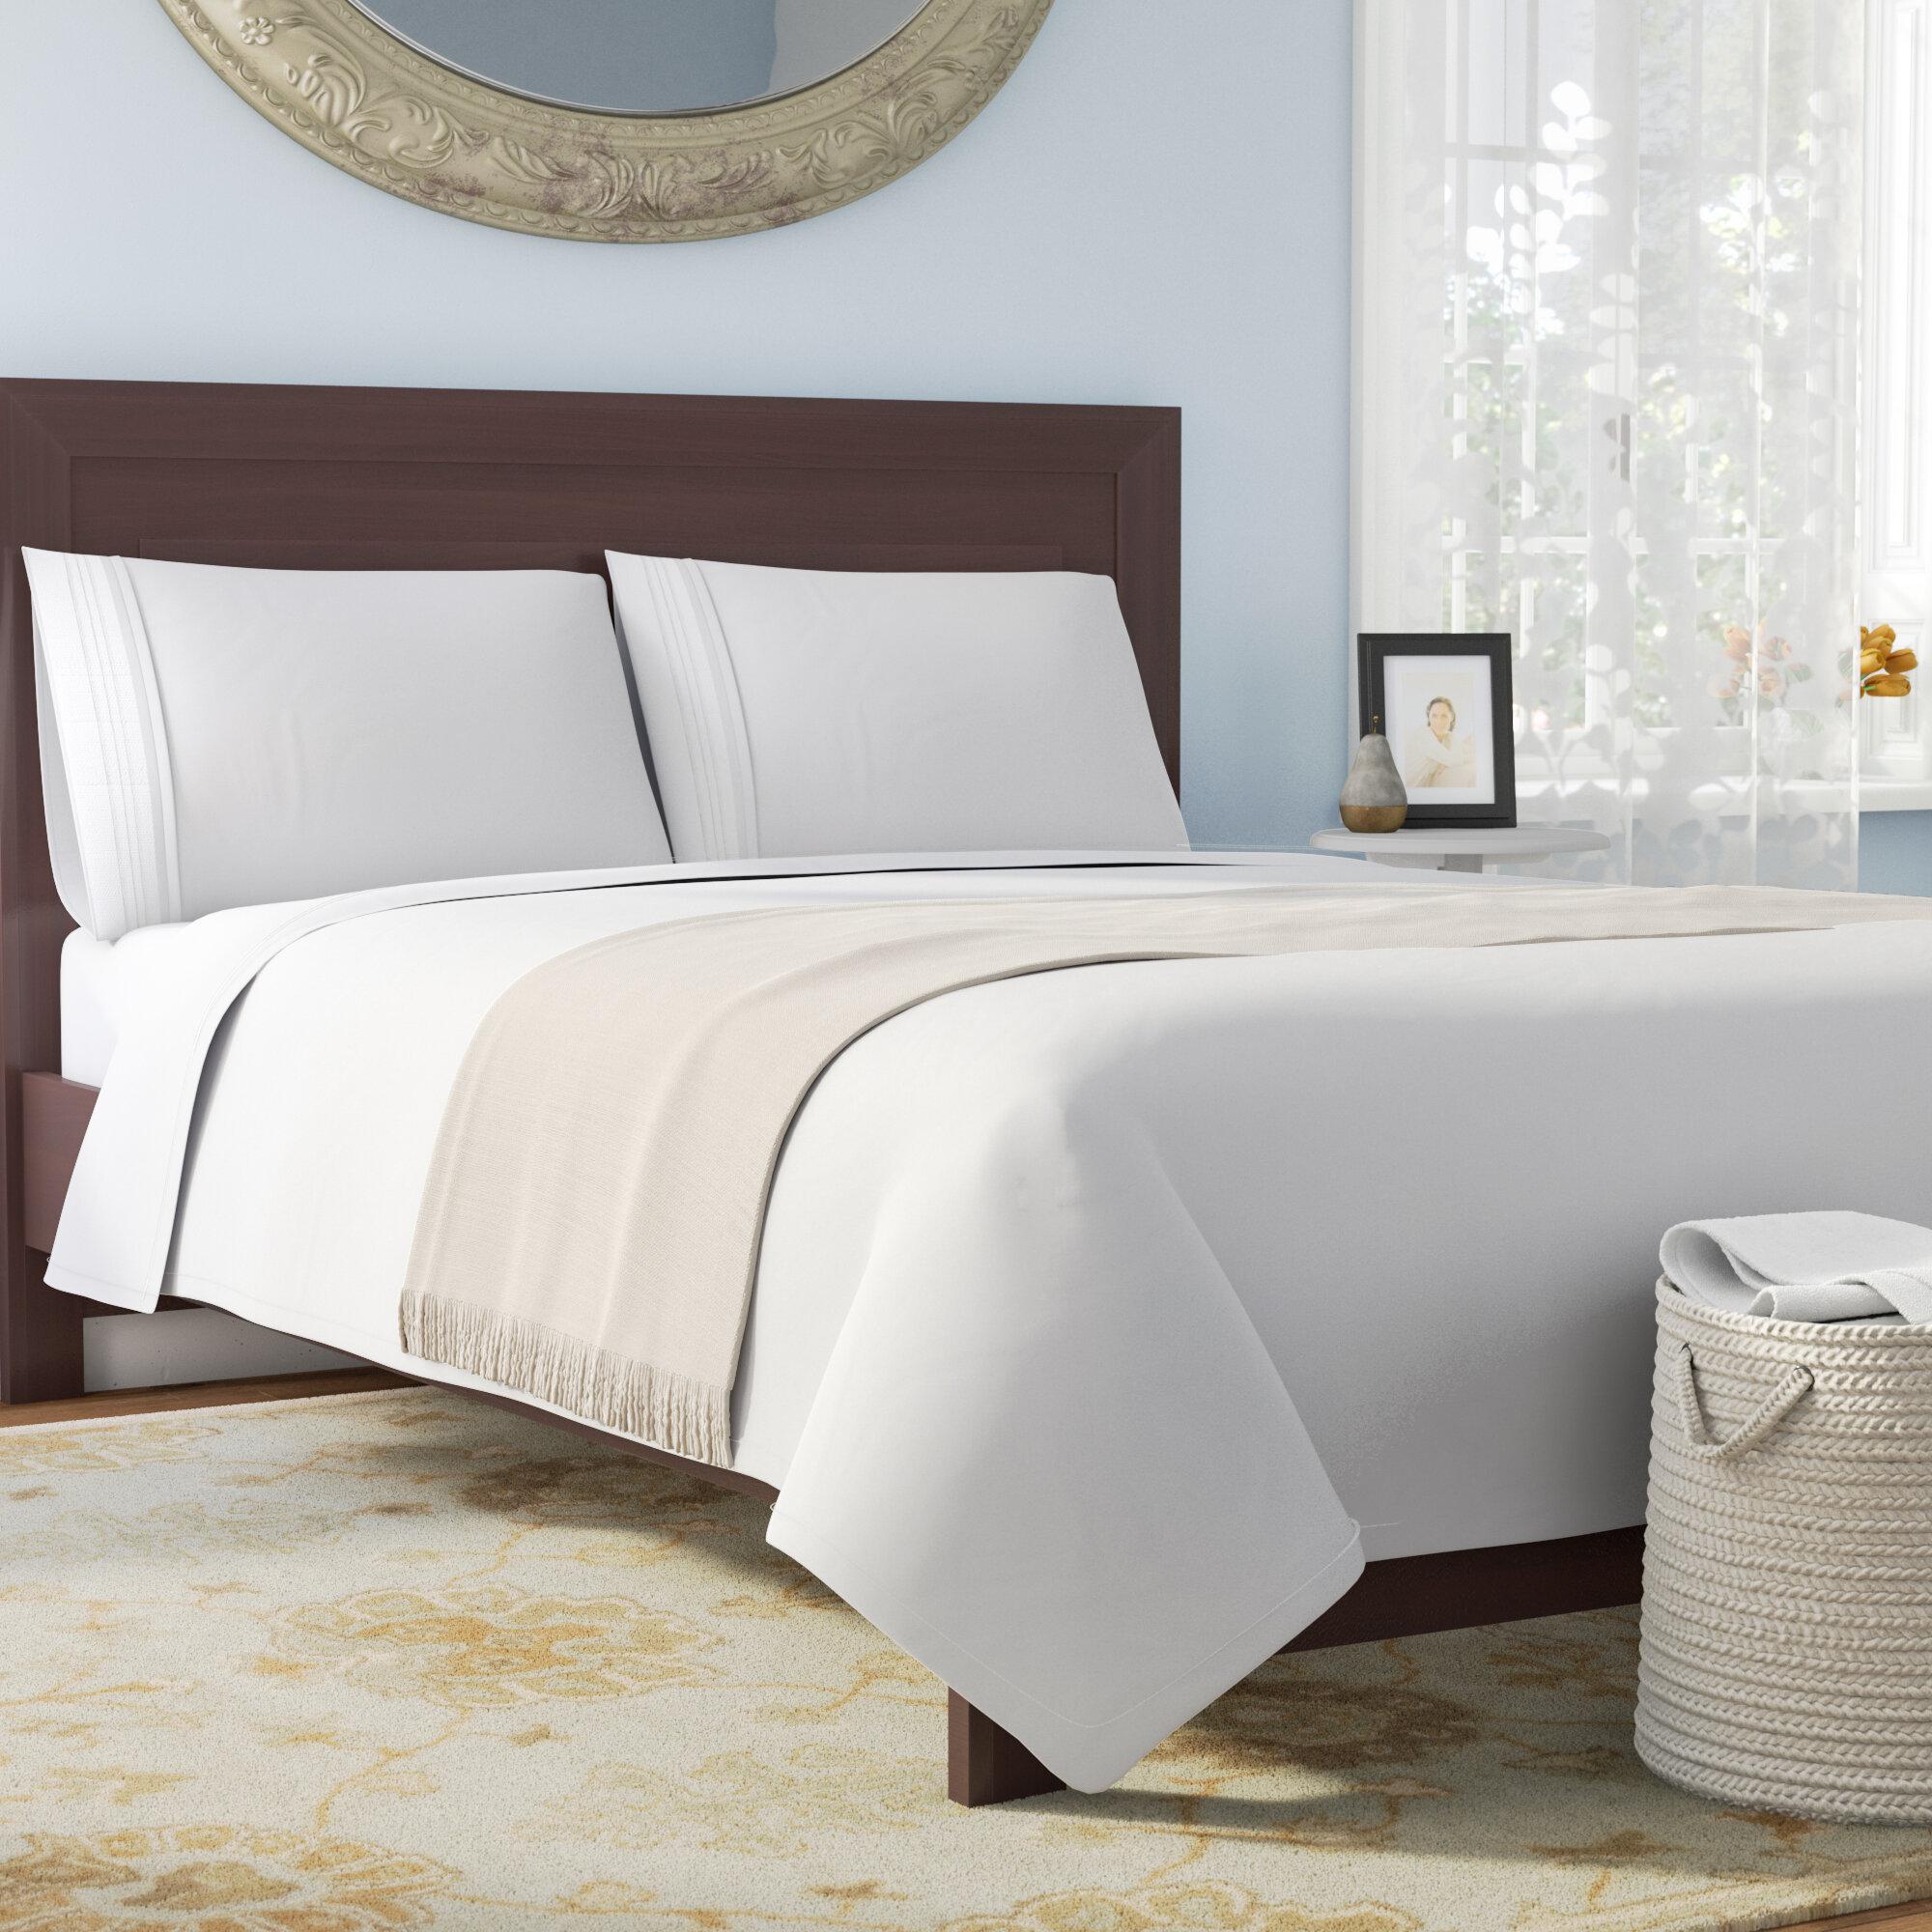 bed bamboo marshalls sheets linen com set dg sheet queen tw comters